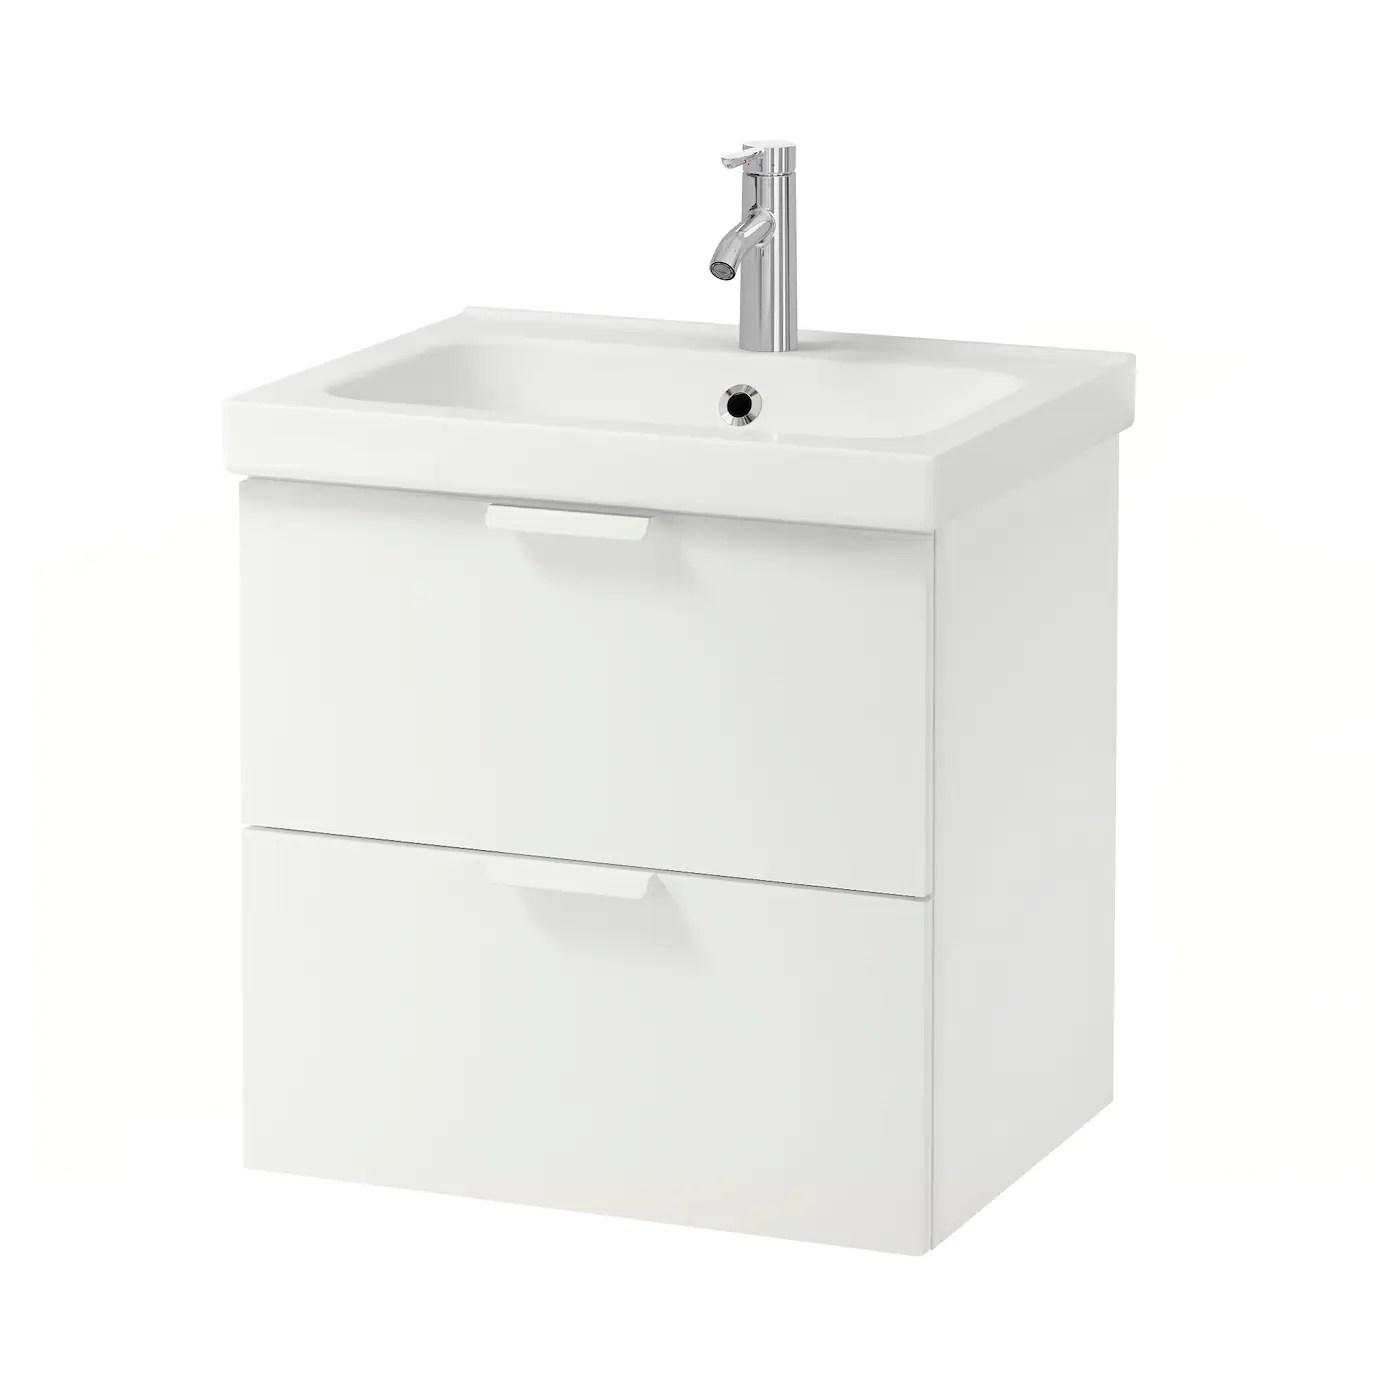 Godmorgon Odensvik Meuble Lavabo 2tir Blanc Dalskar Mitigeur Lavabo 63x49x64 Cm Ikea